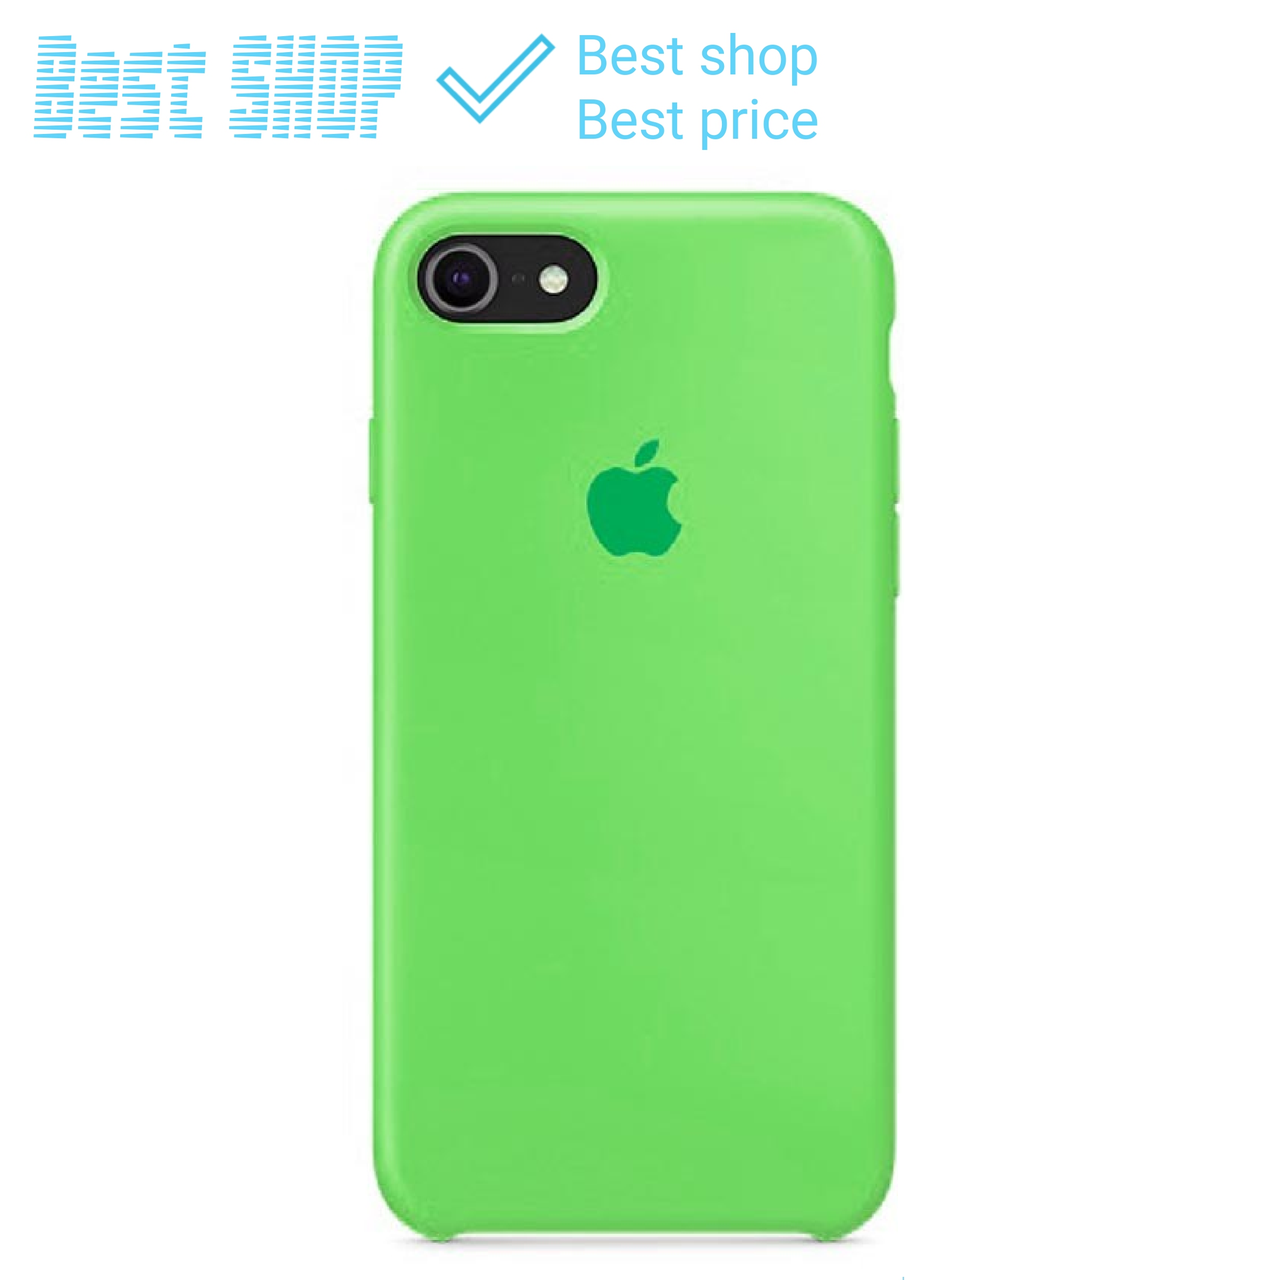 29 Цветов Силиконовый чехол Apple Silicone Case для iPhone 7 Plus/ iPhone 8 Plus